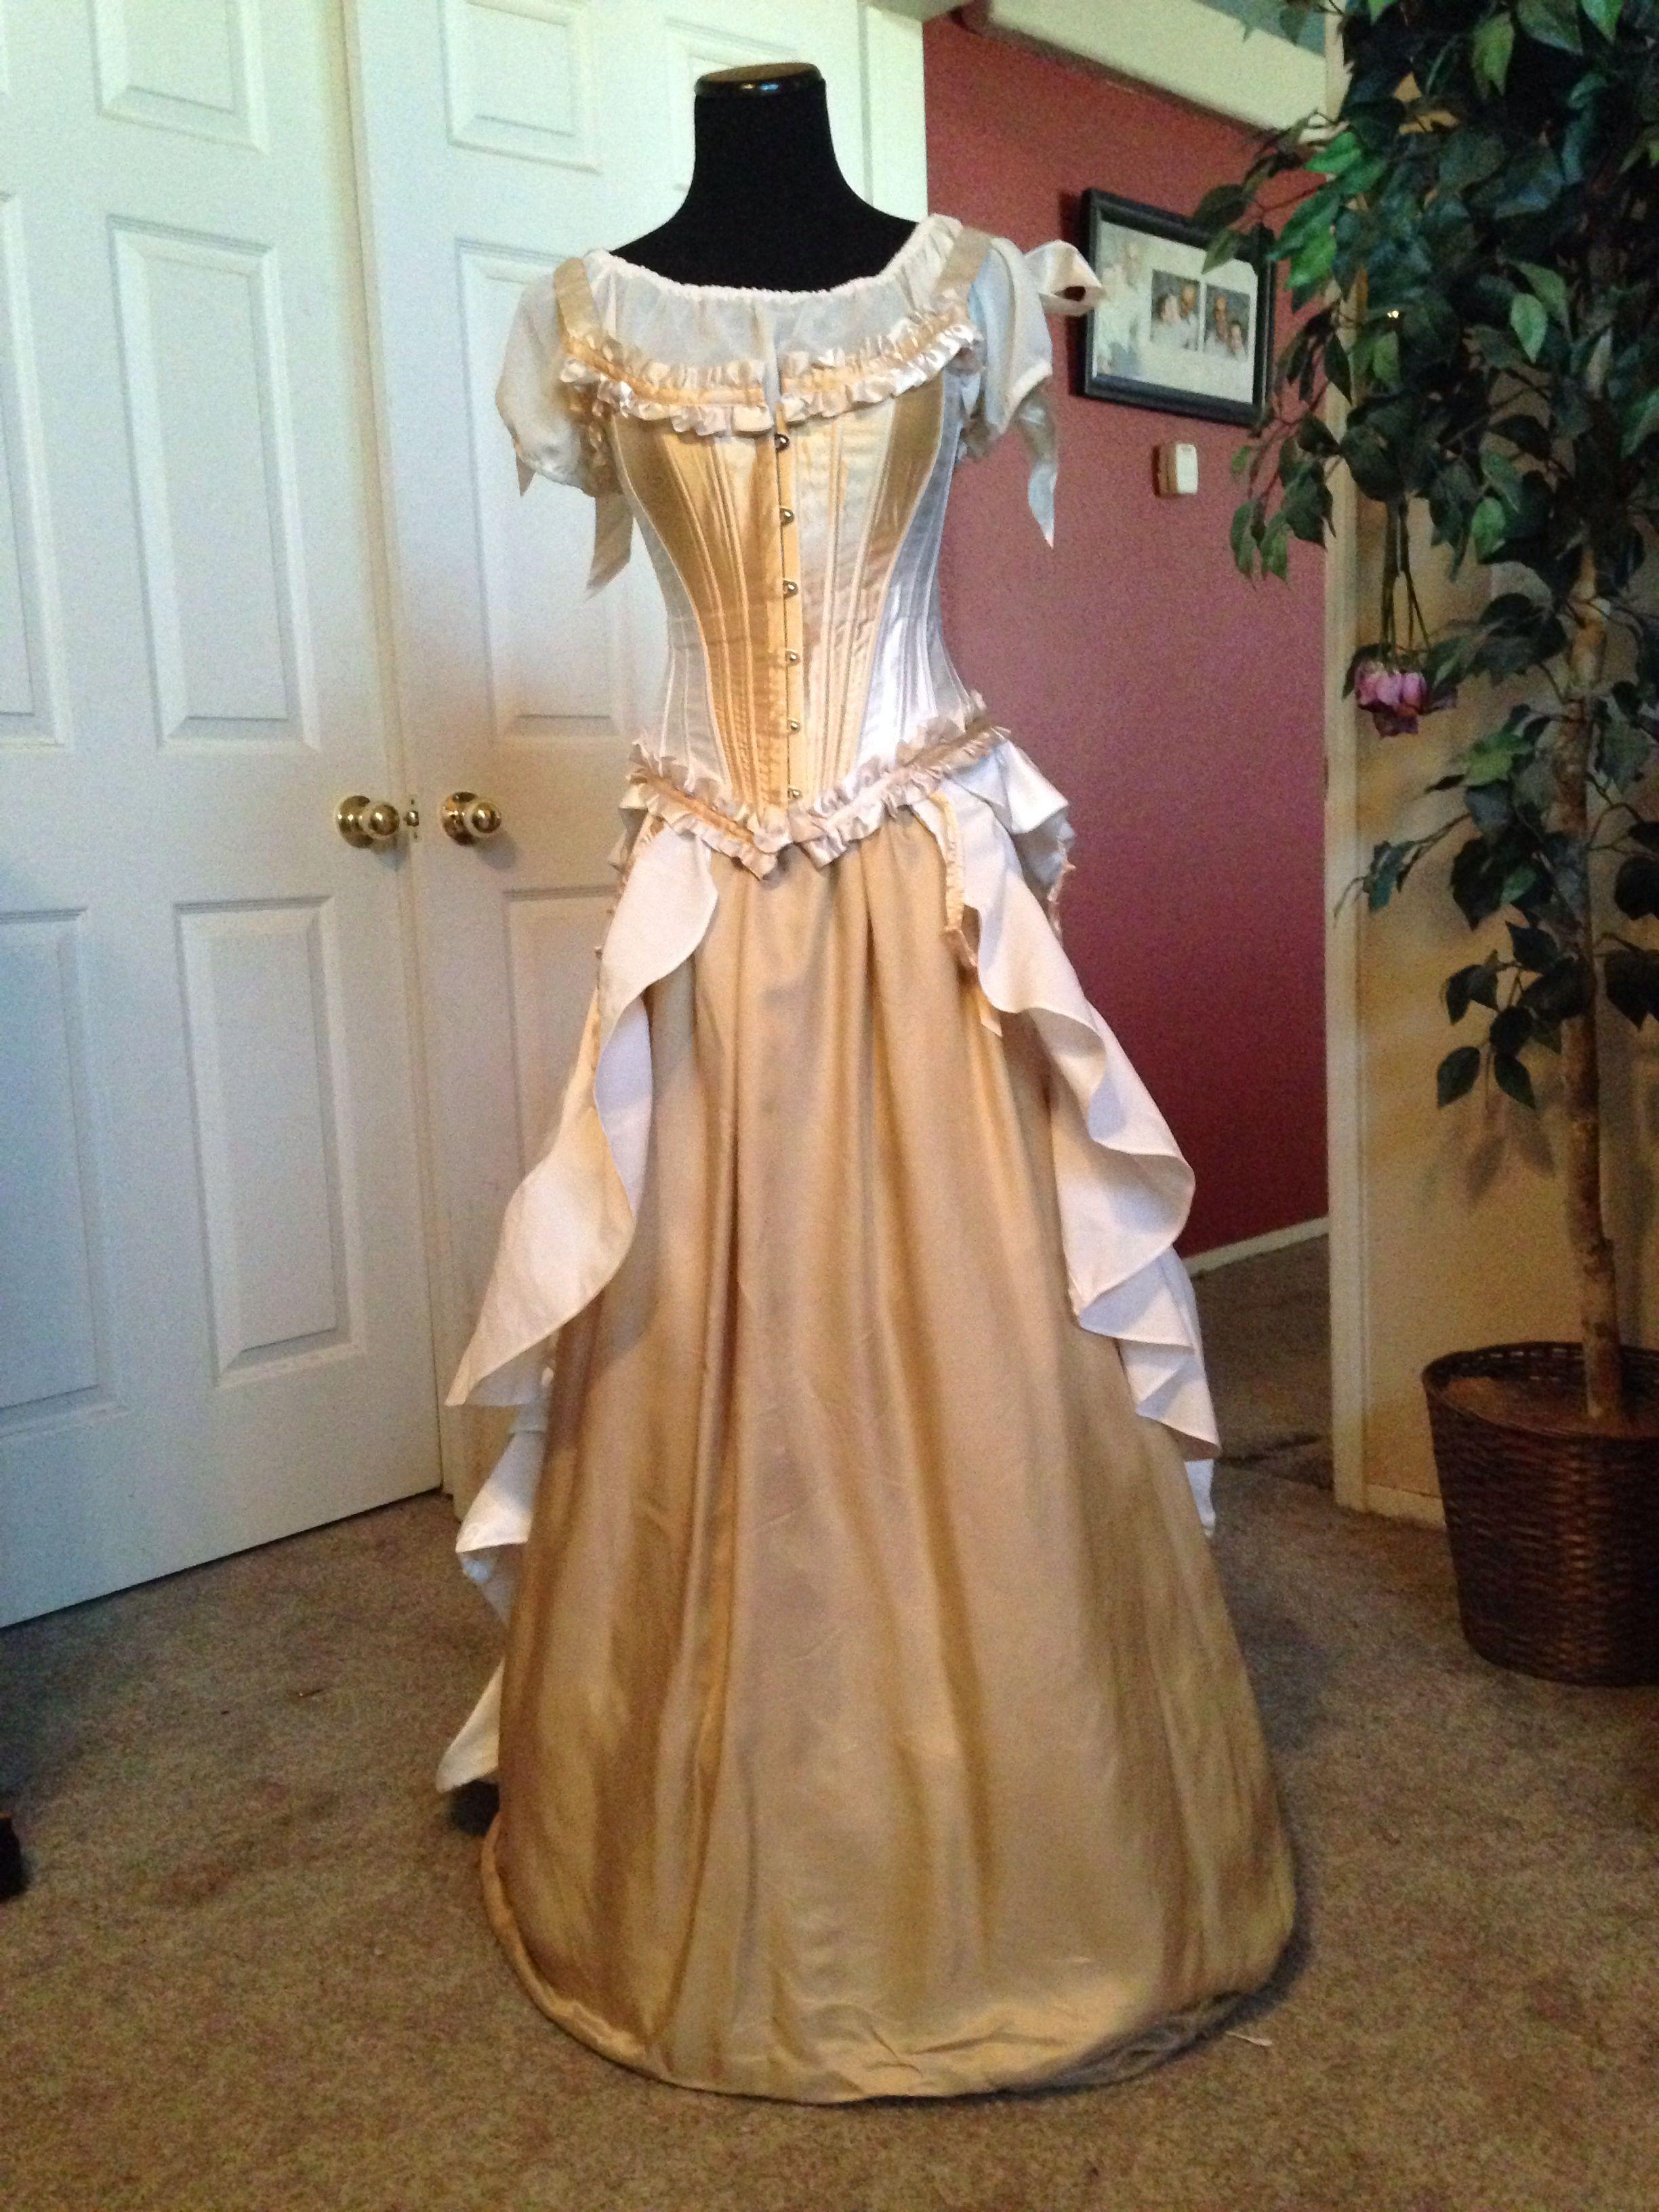 My Old West Wedding Dress